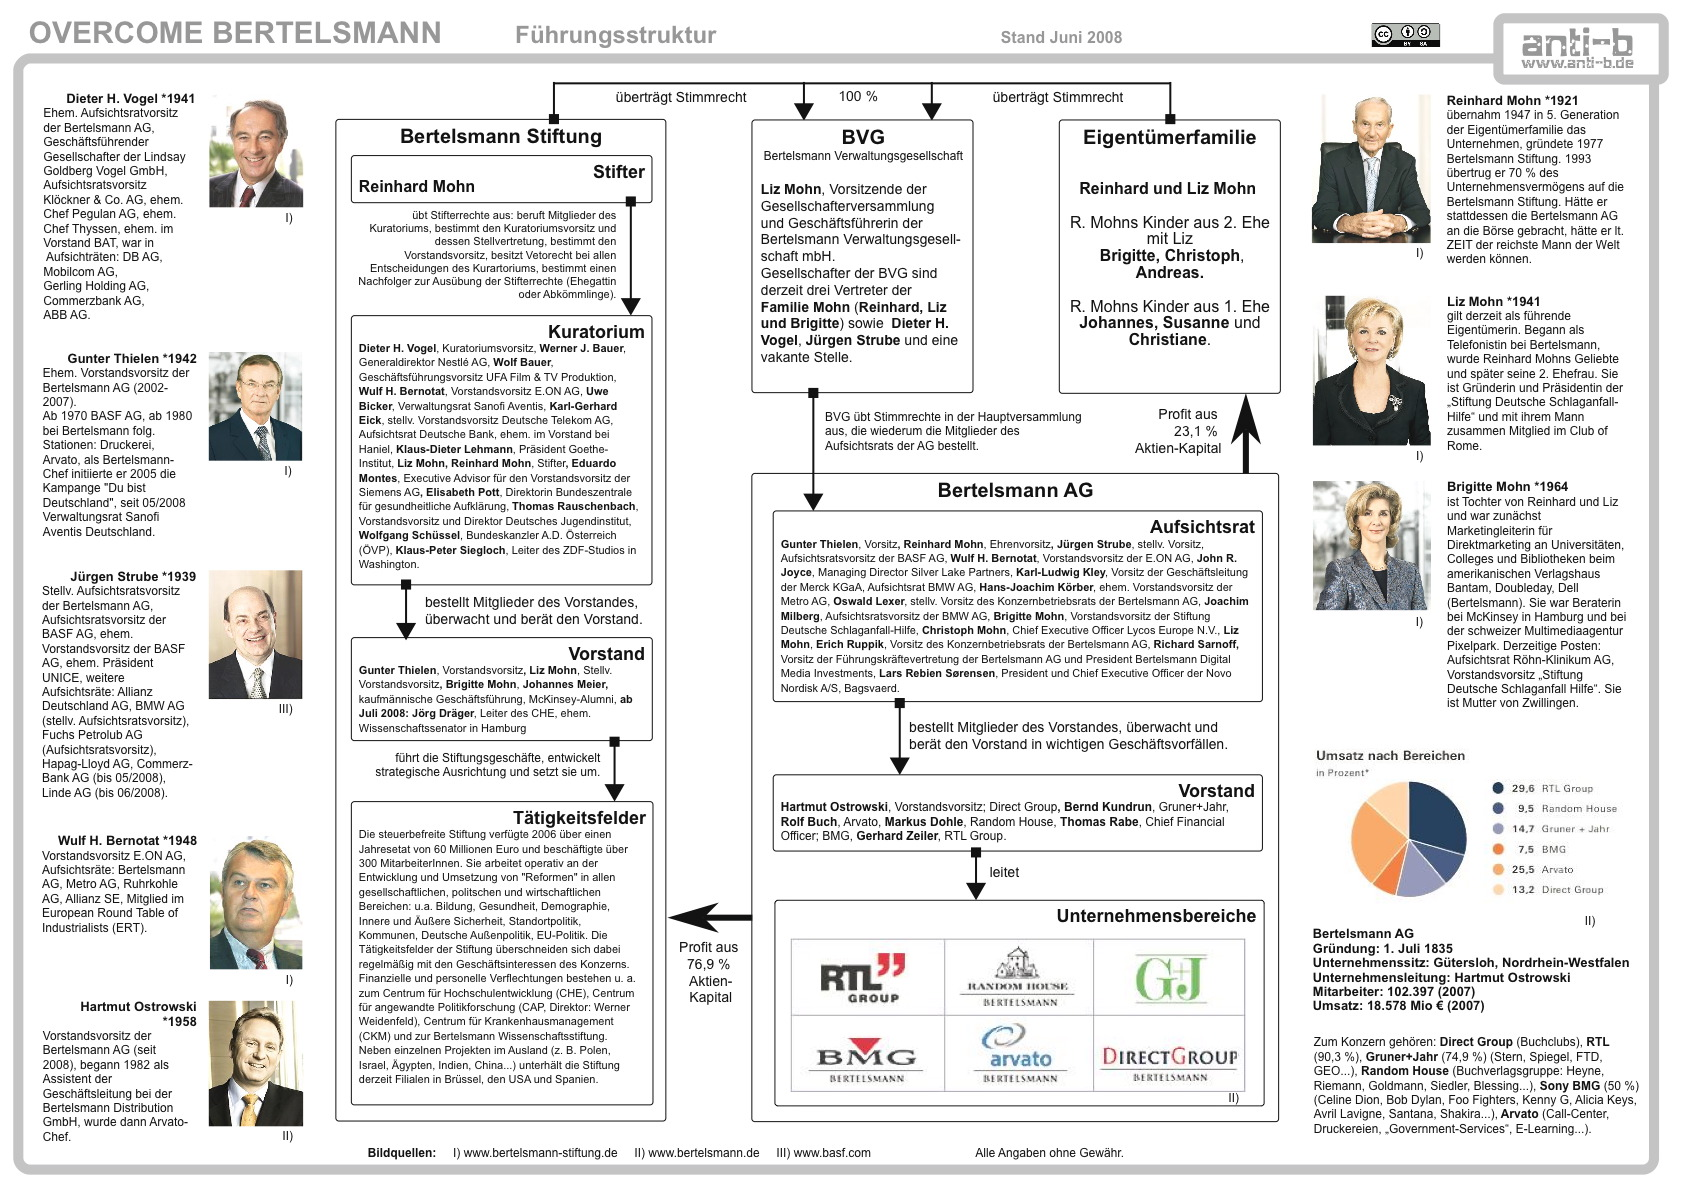 https://i2.wp.com/www.who-owns-the-world.org/wp-content/uploads/2009/03/organigramm.jpg